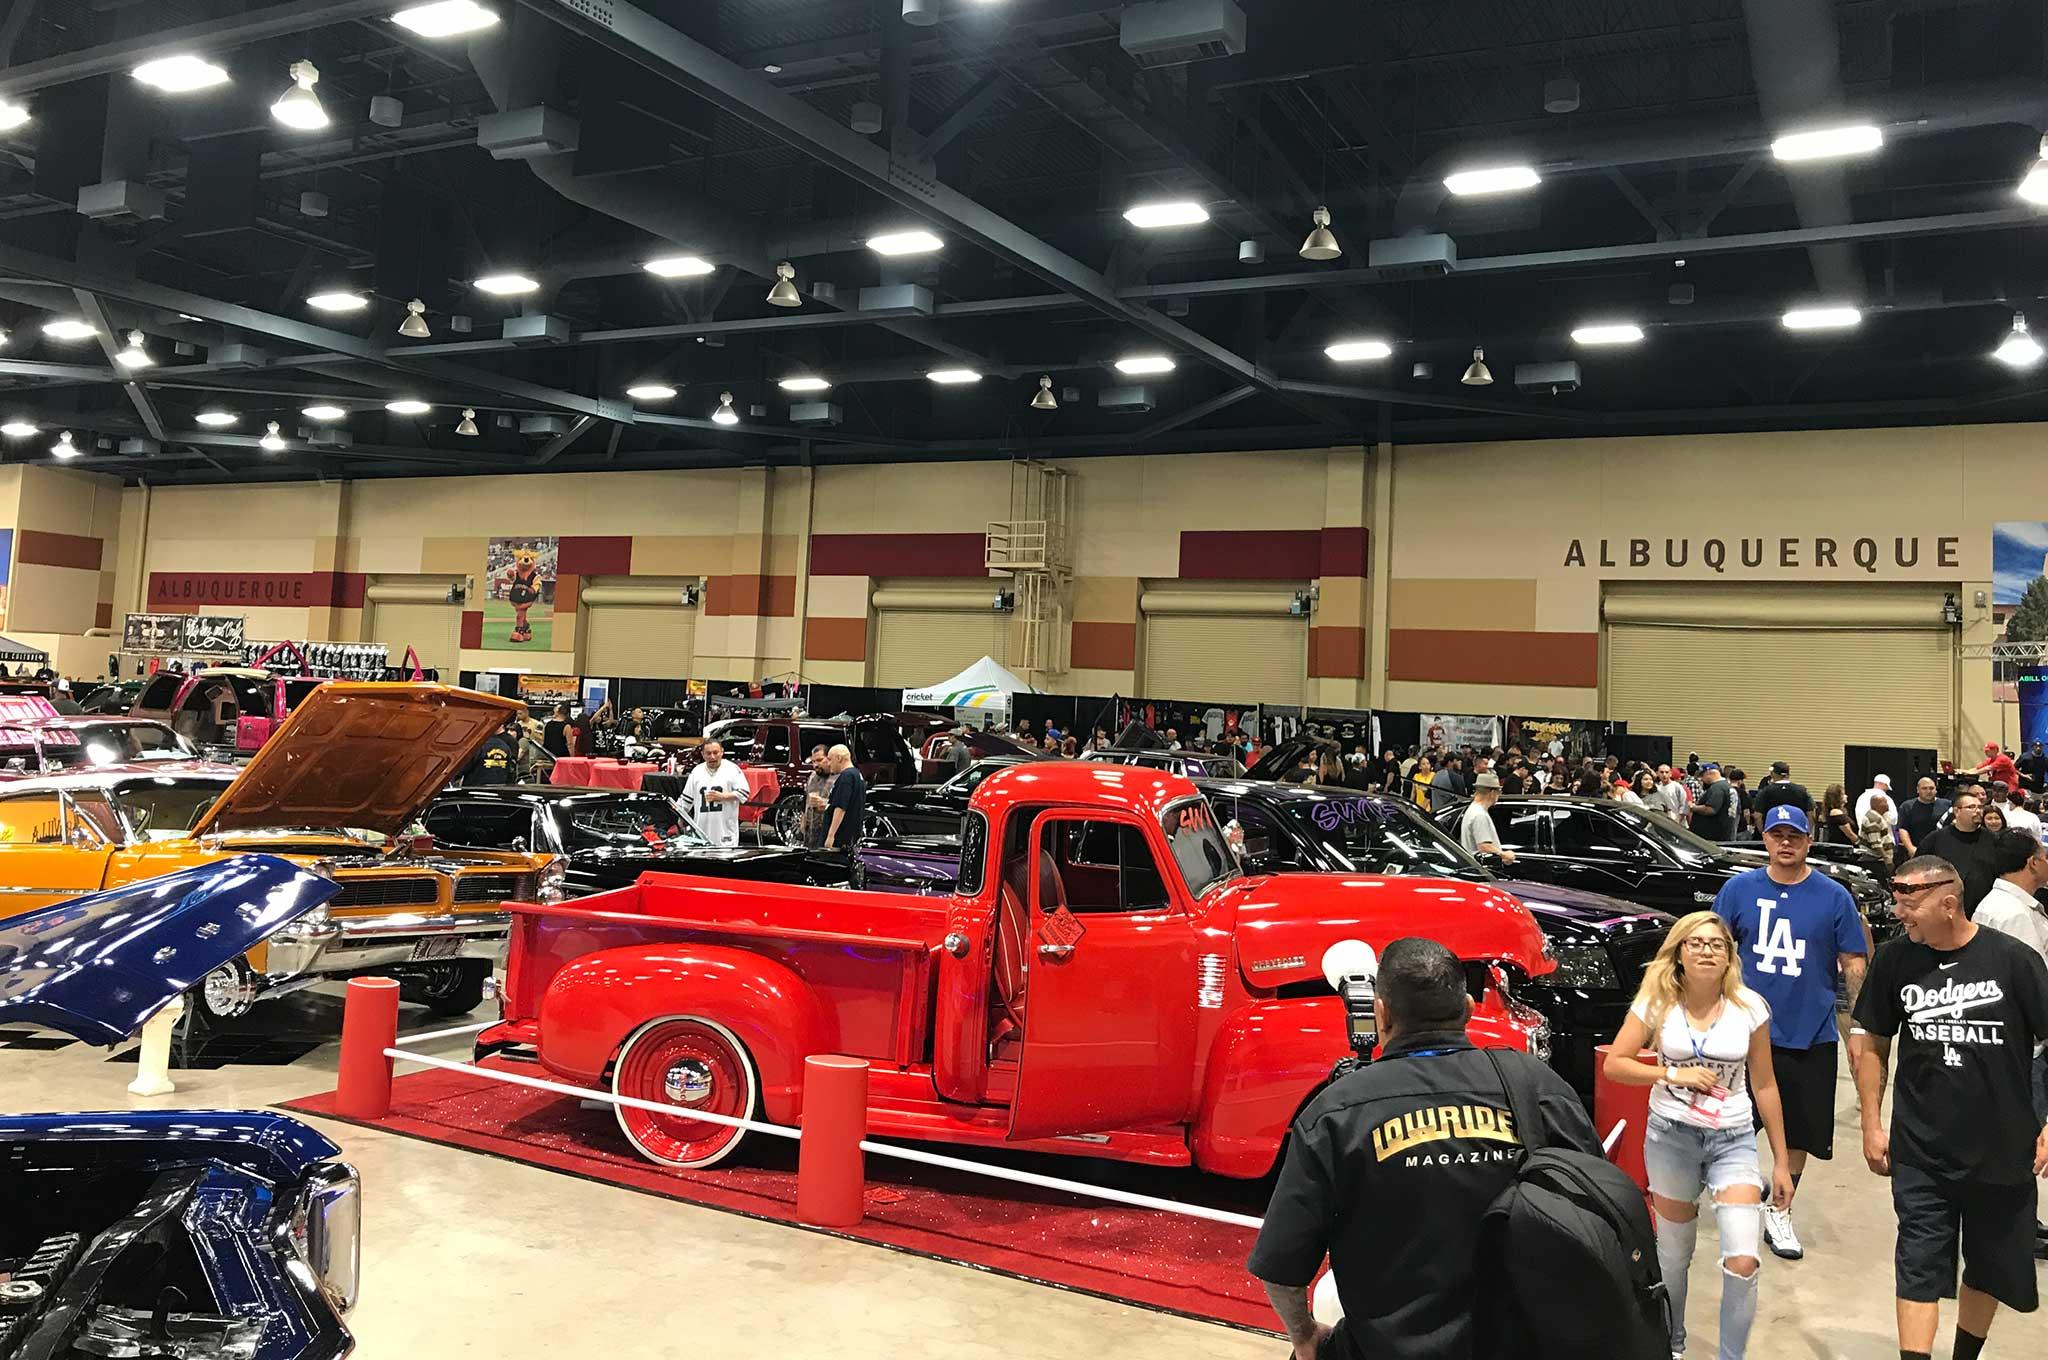 LOWRIDER Albuquerque Show Albuquerque Convention Center - Lowrider car show ticket price